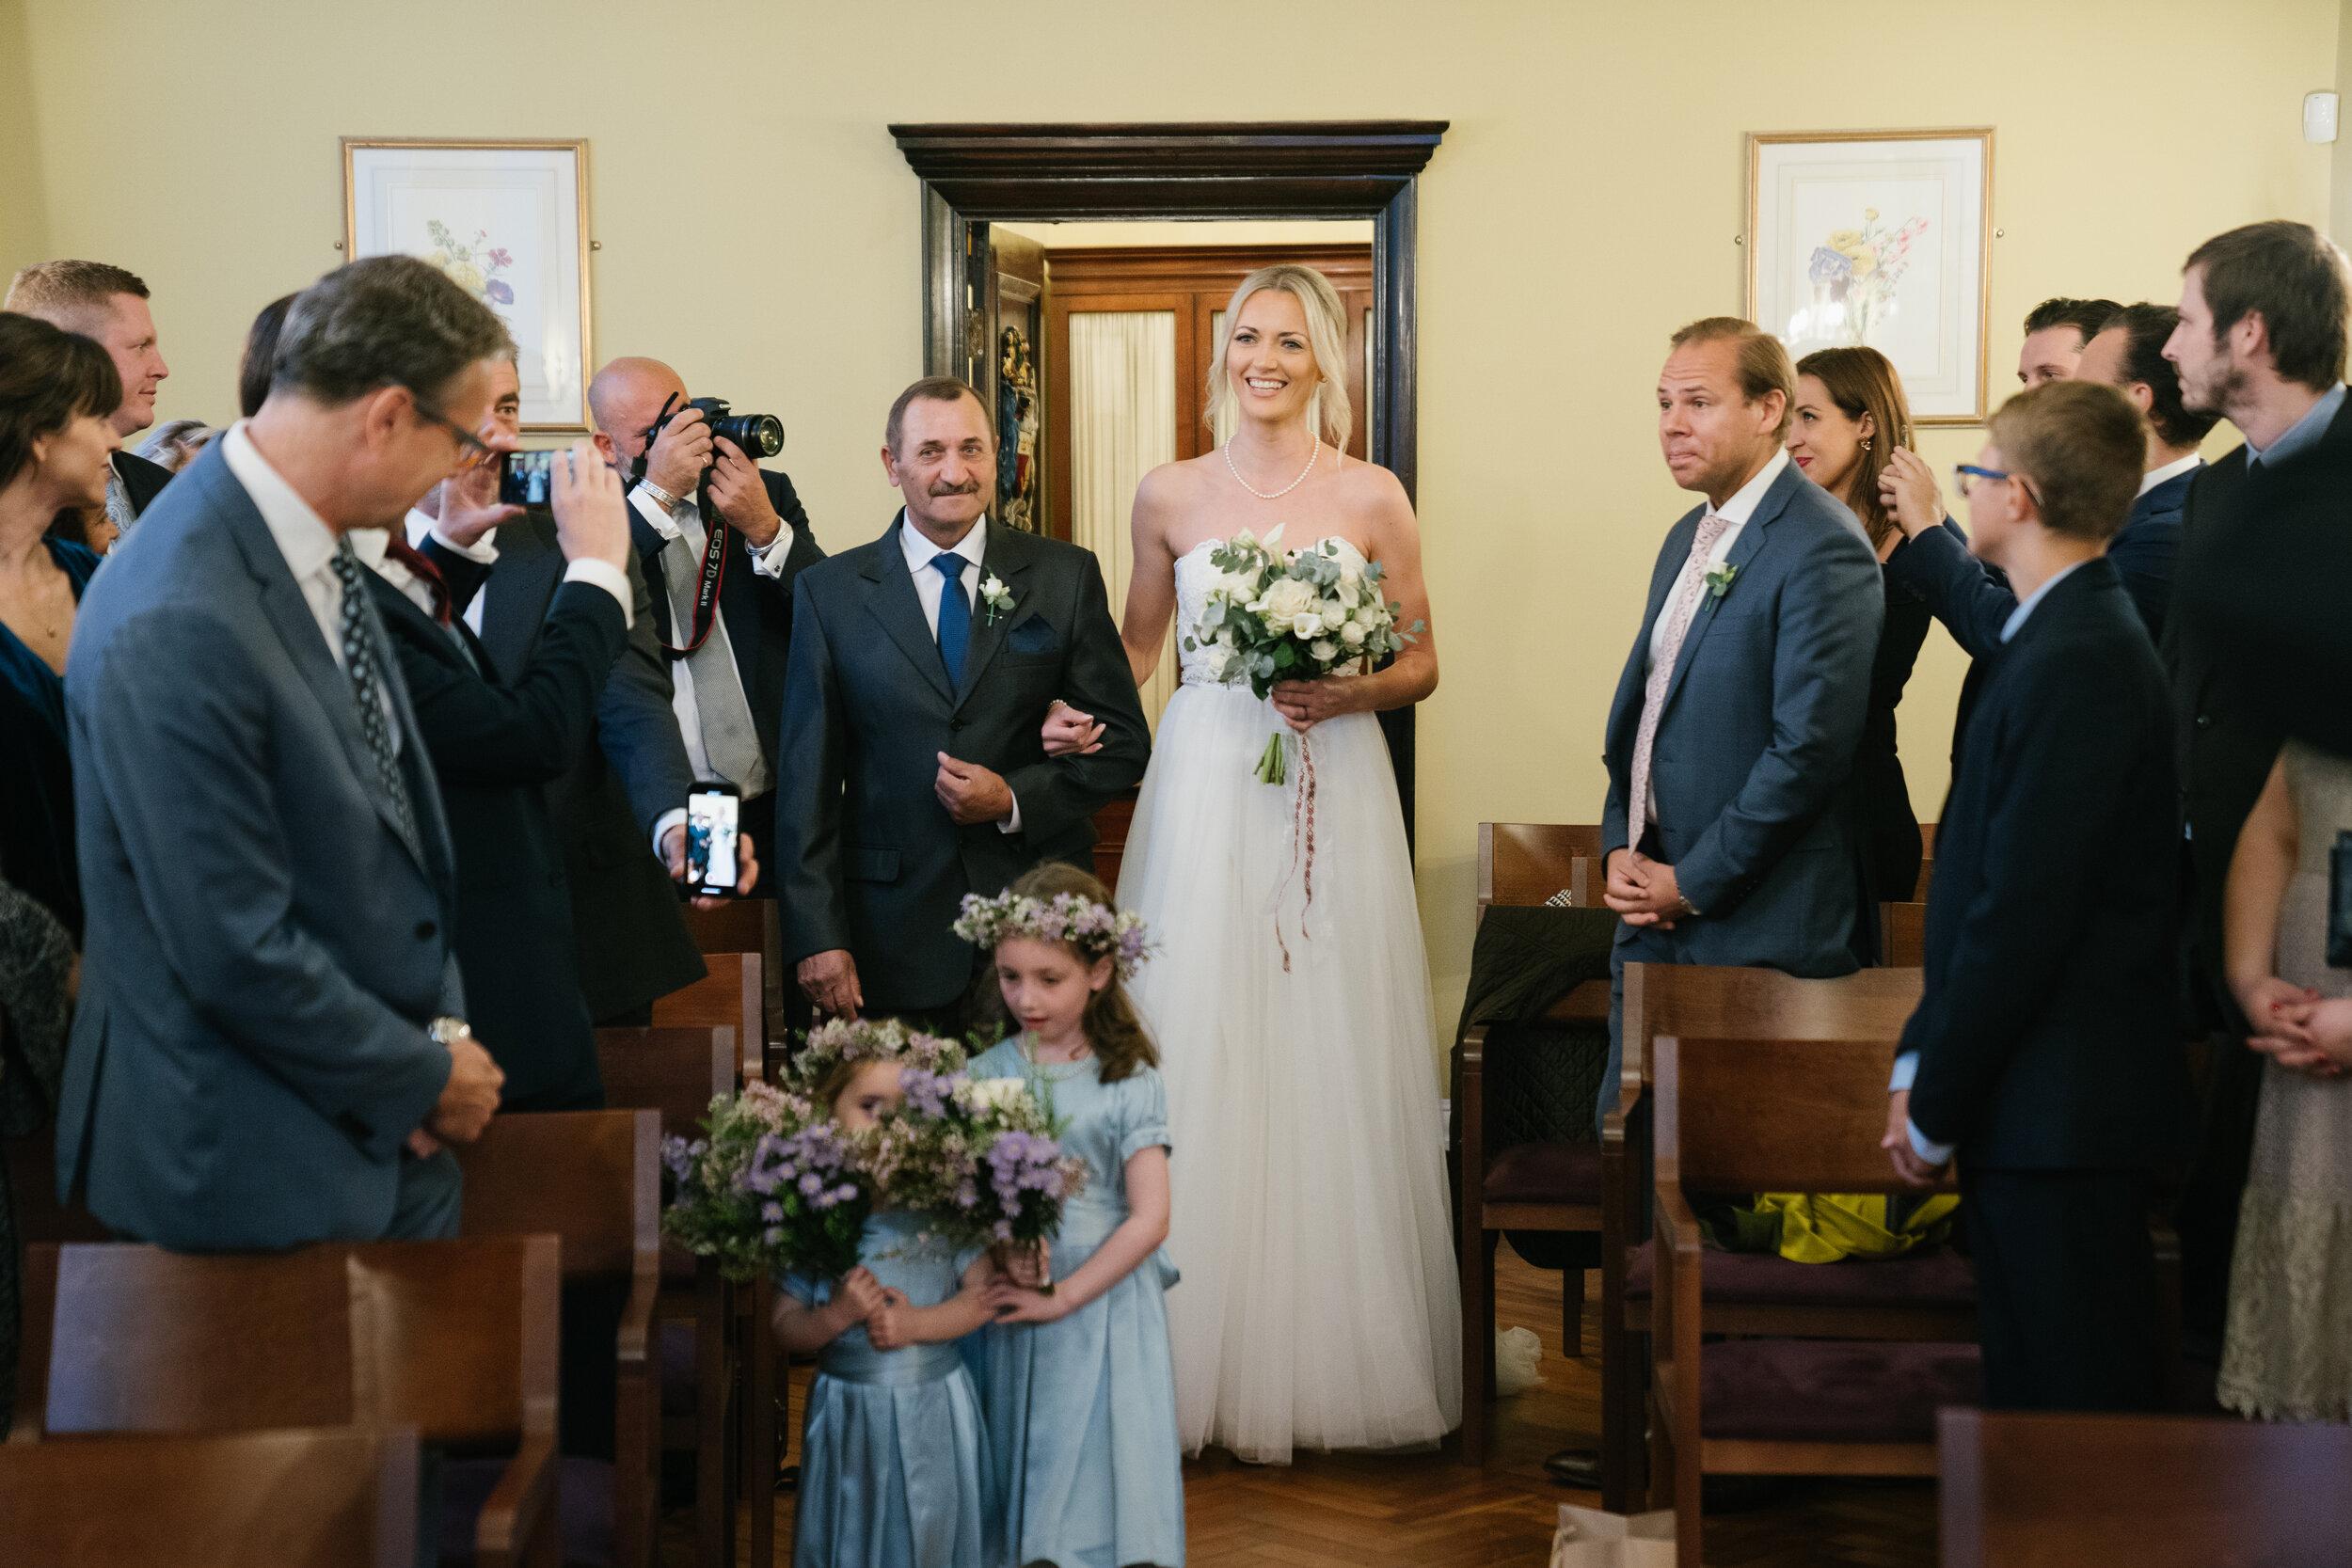 chelsea-london-wedding-photographer-videographer-bchelsea-town-hall-101